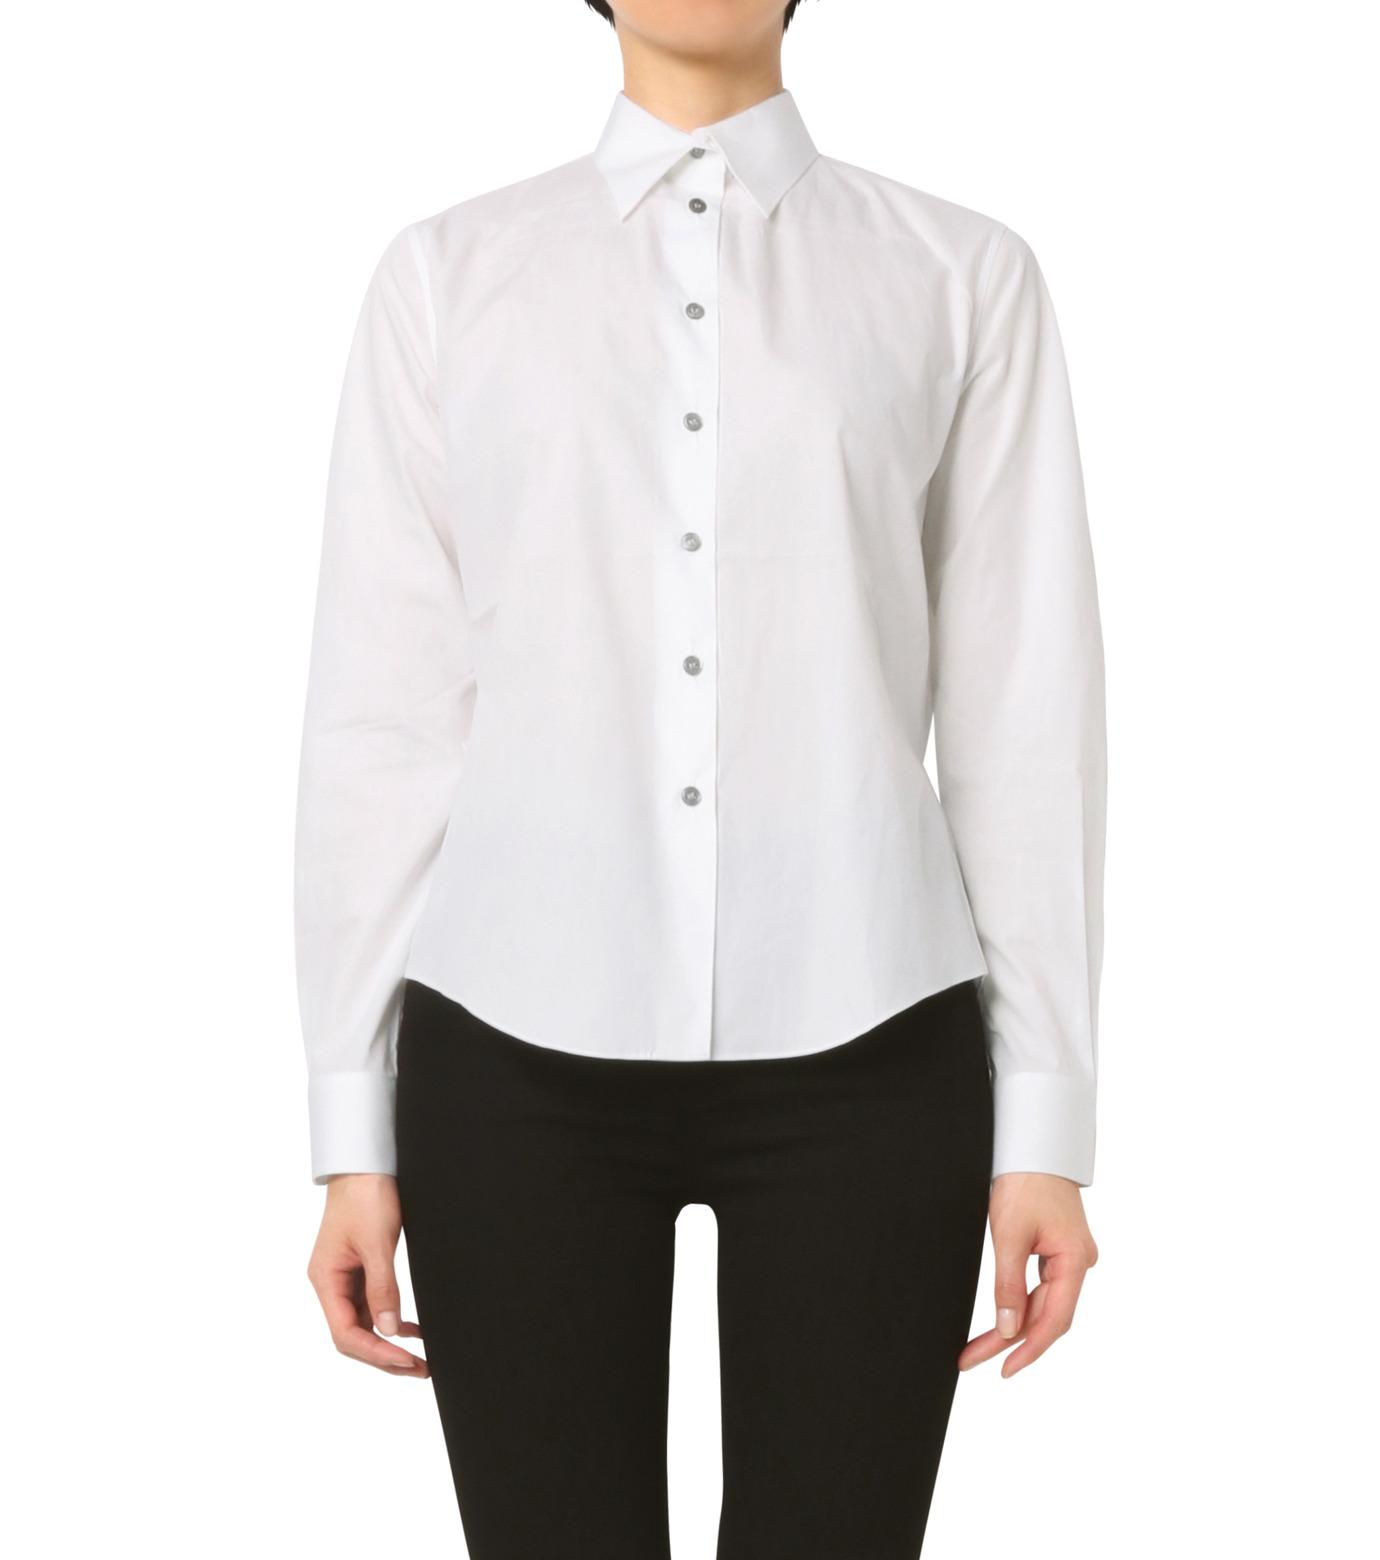 Jourden(ジョーダン)のWhite Shirt w/Ruffle Back Slit-WHITE(シャツ/shirt)-1603WC1TH01-4 拡大詳細画像1